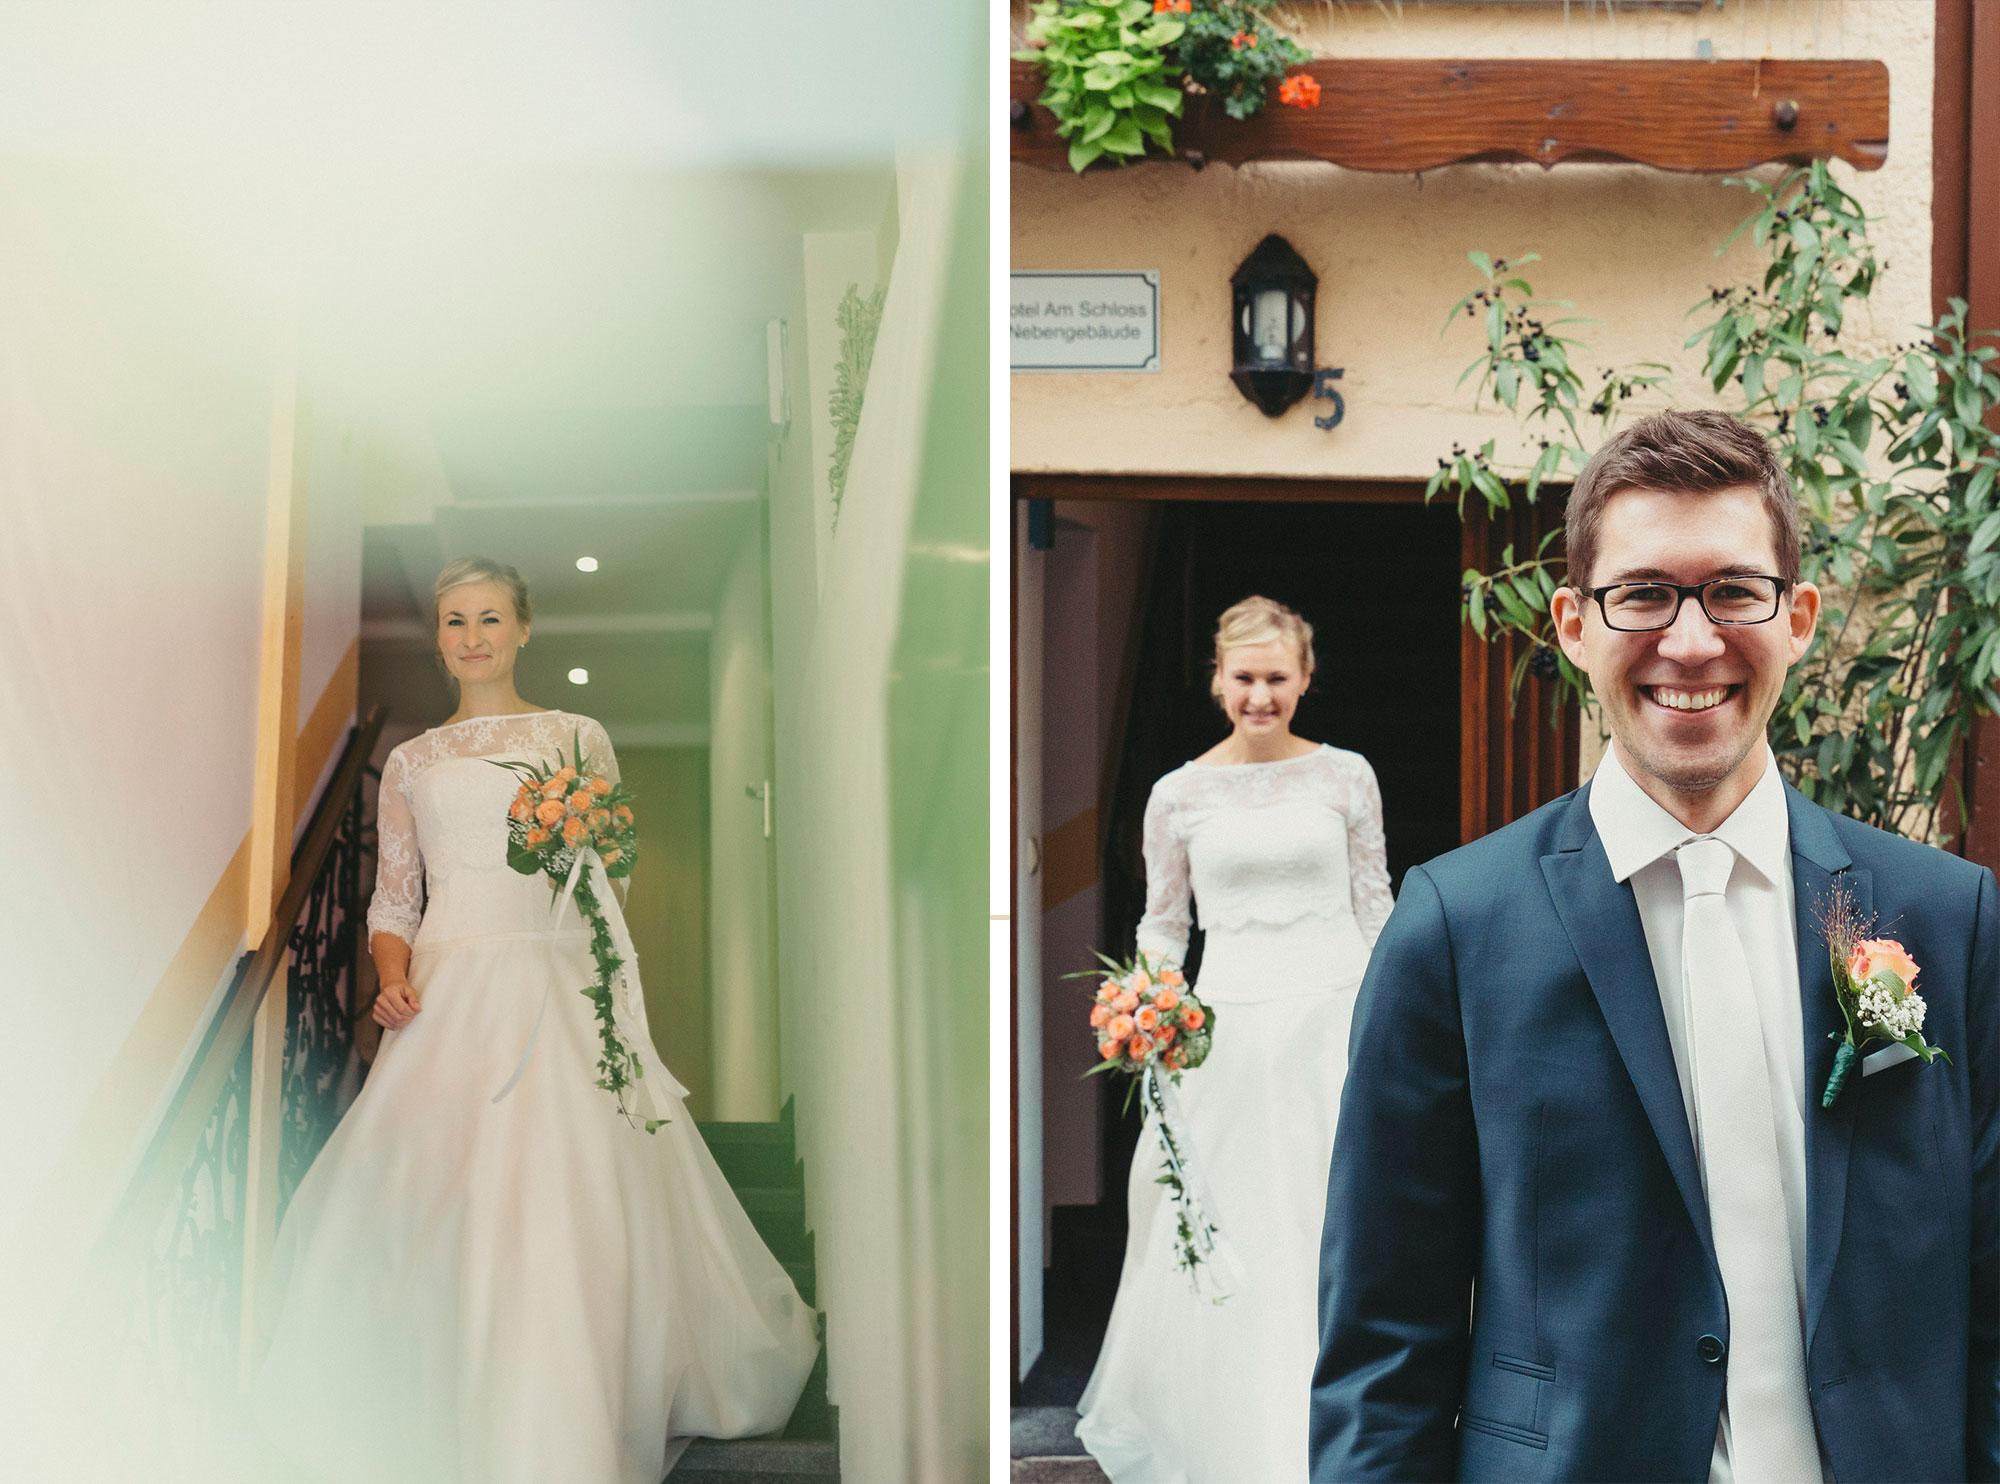 Hochzeitsfotografie-Tuebingen-Doro-Stefan-3